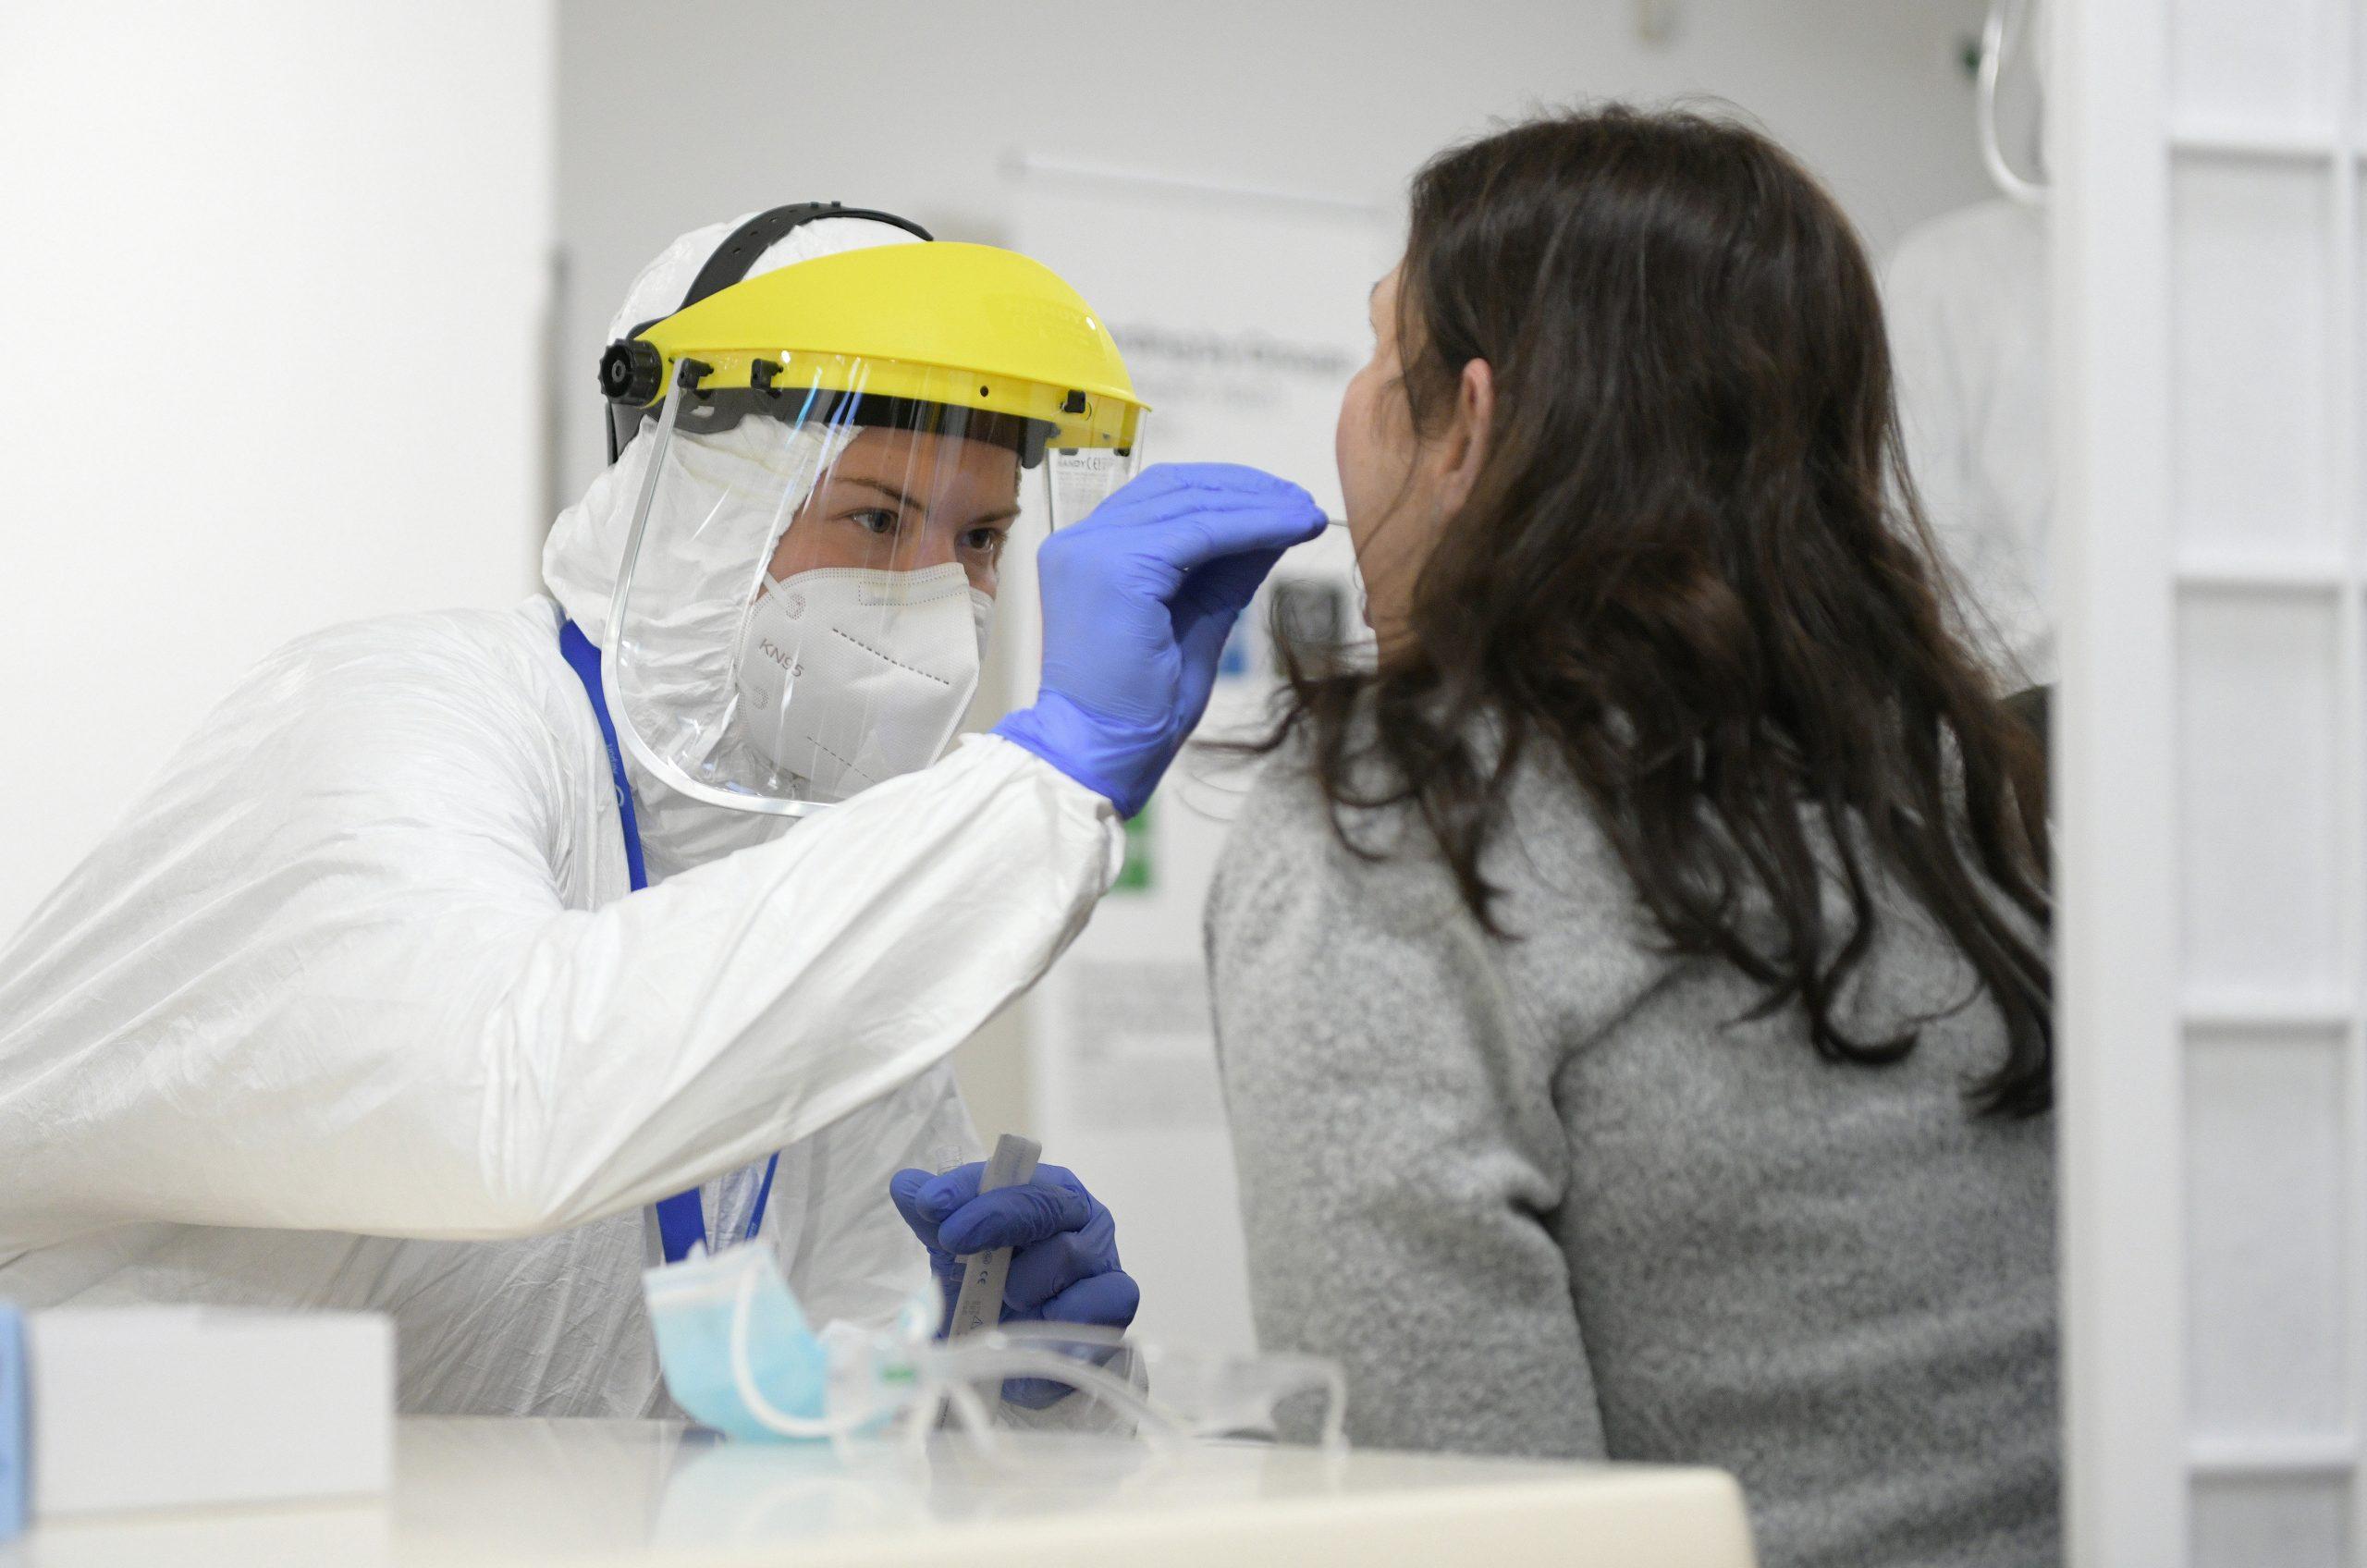 Corona am Montag: Erneut niedrige Neuinfektionen